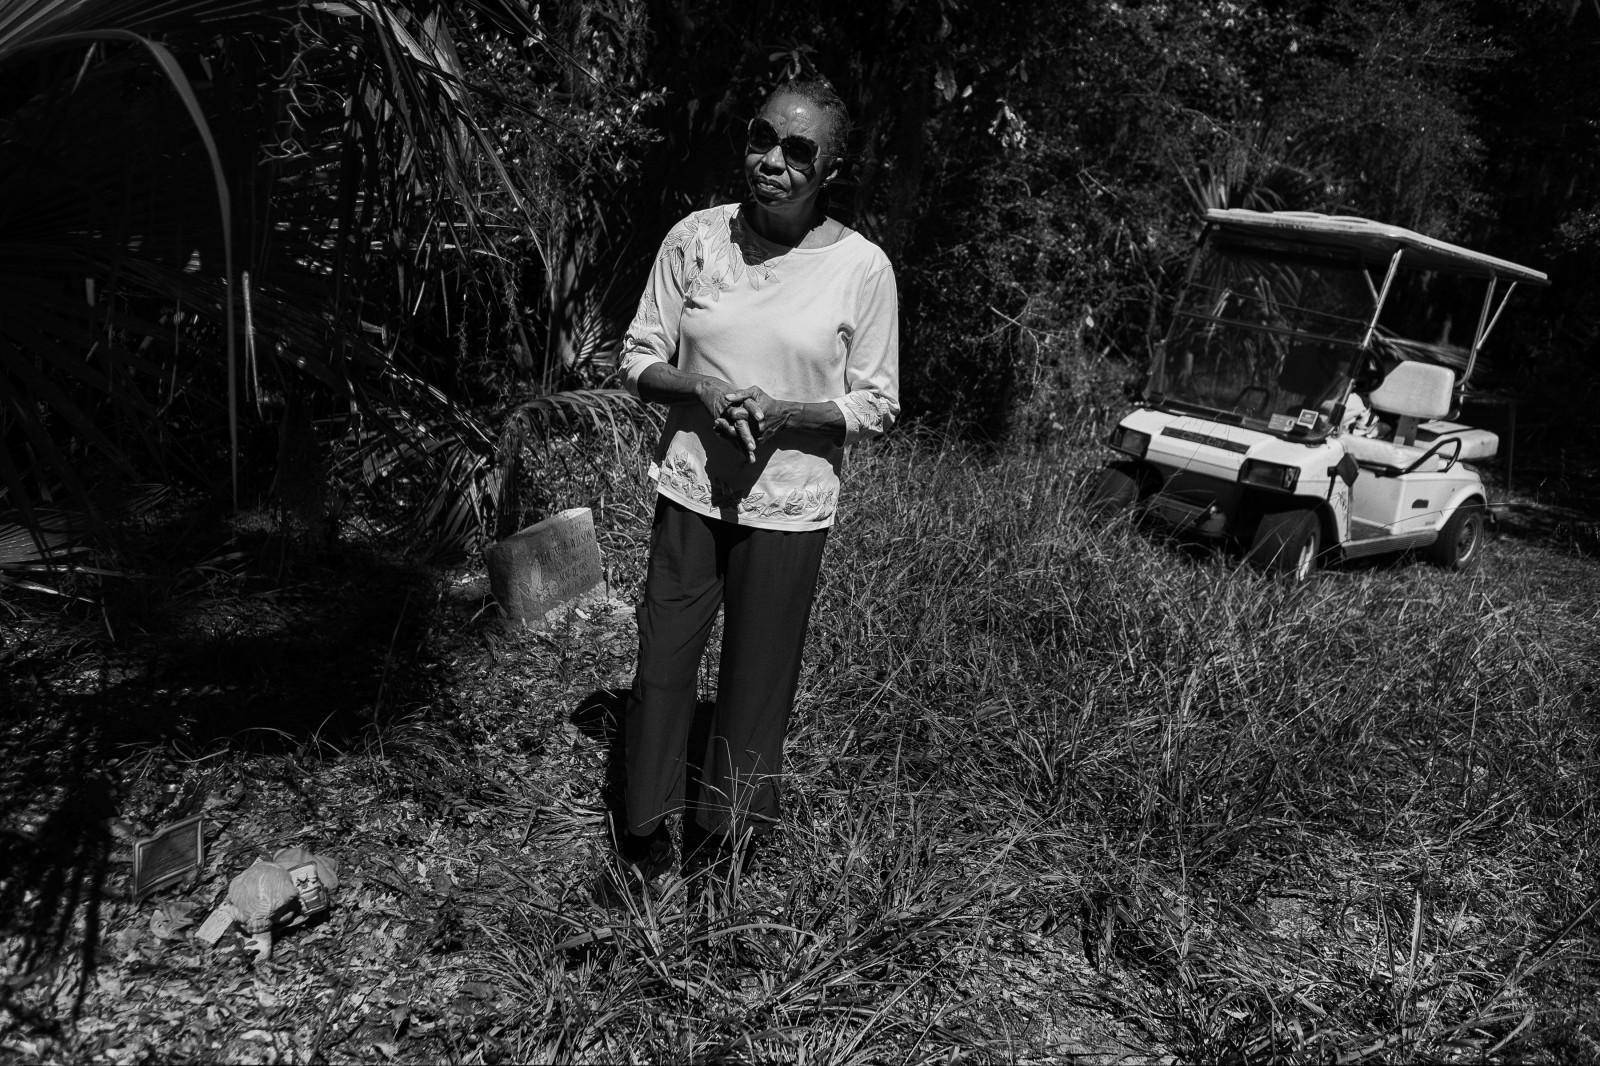 Yvonne Wilson at her son's gravesite.